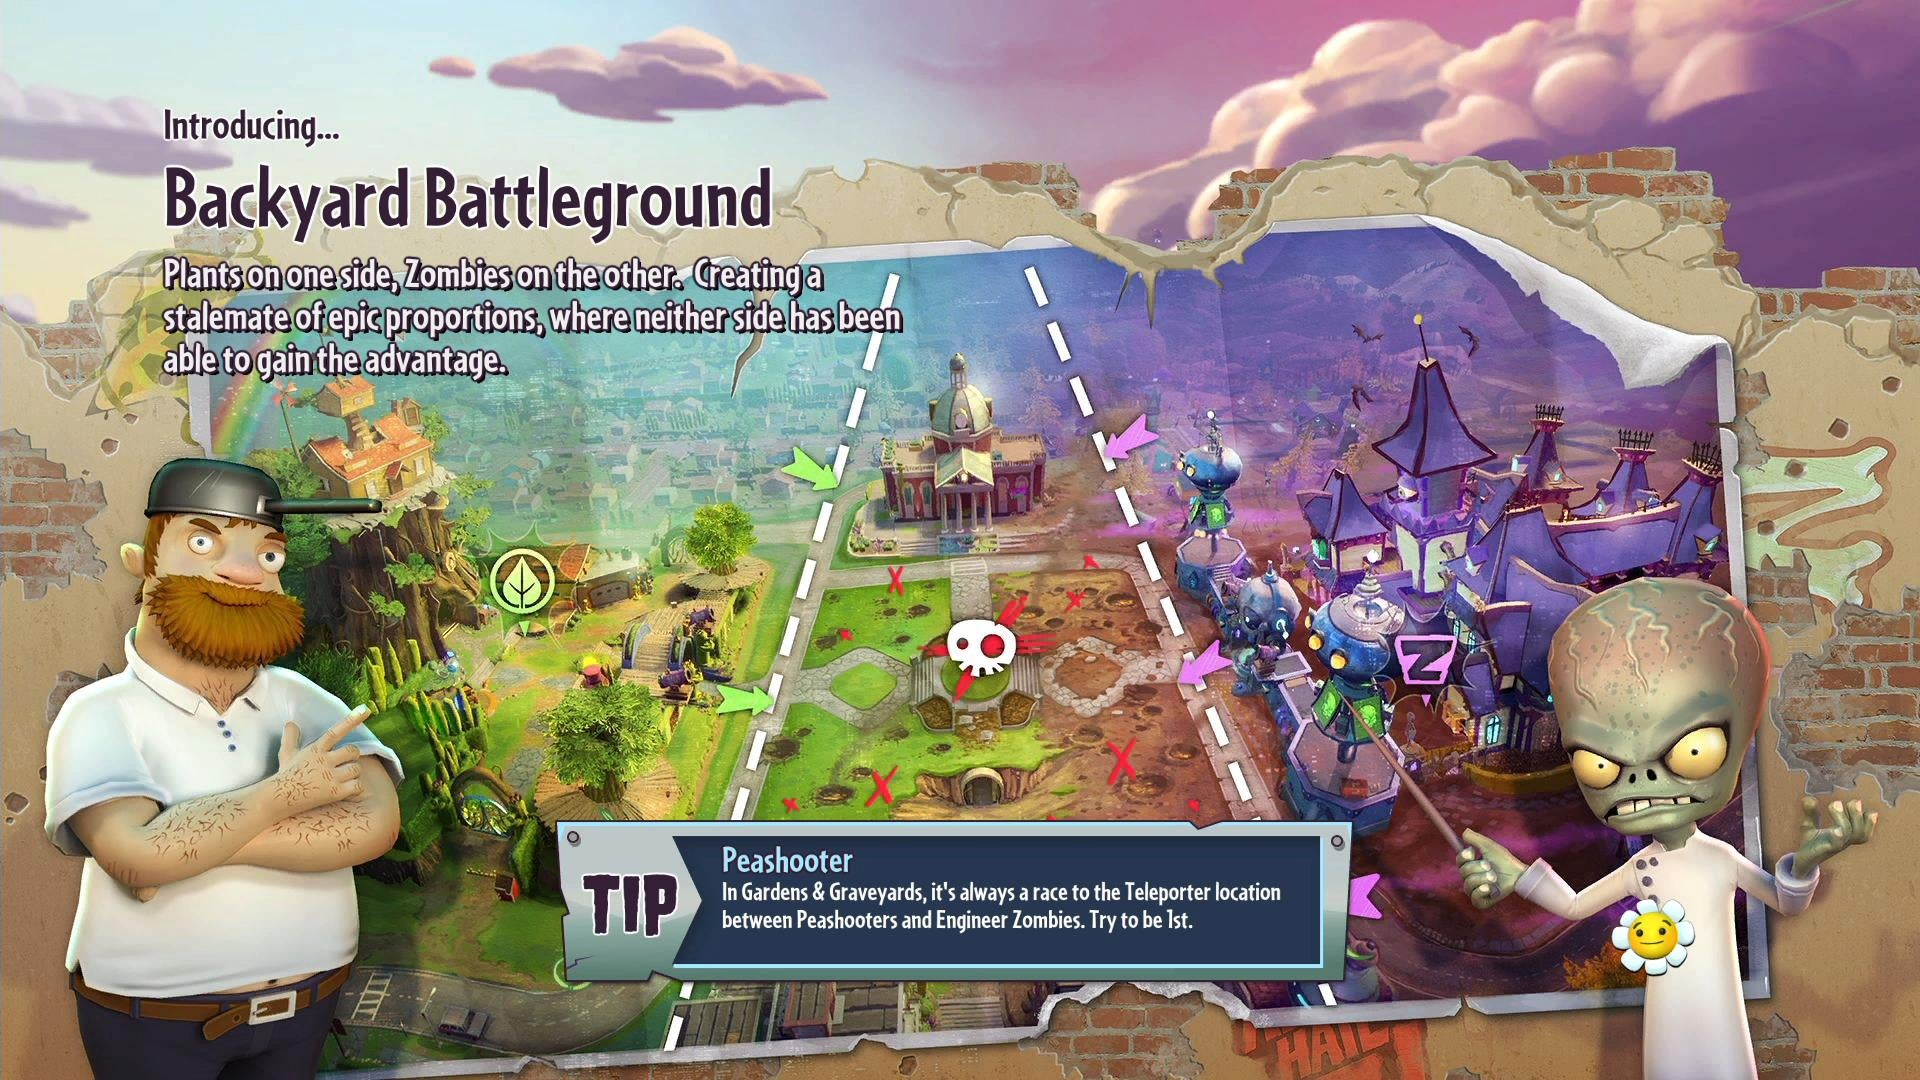 Plants Vs. Zombies: Garden Warfare 2: The Kotaku Review